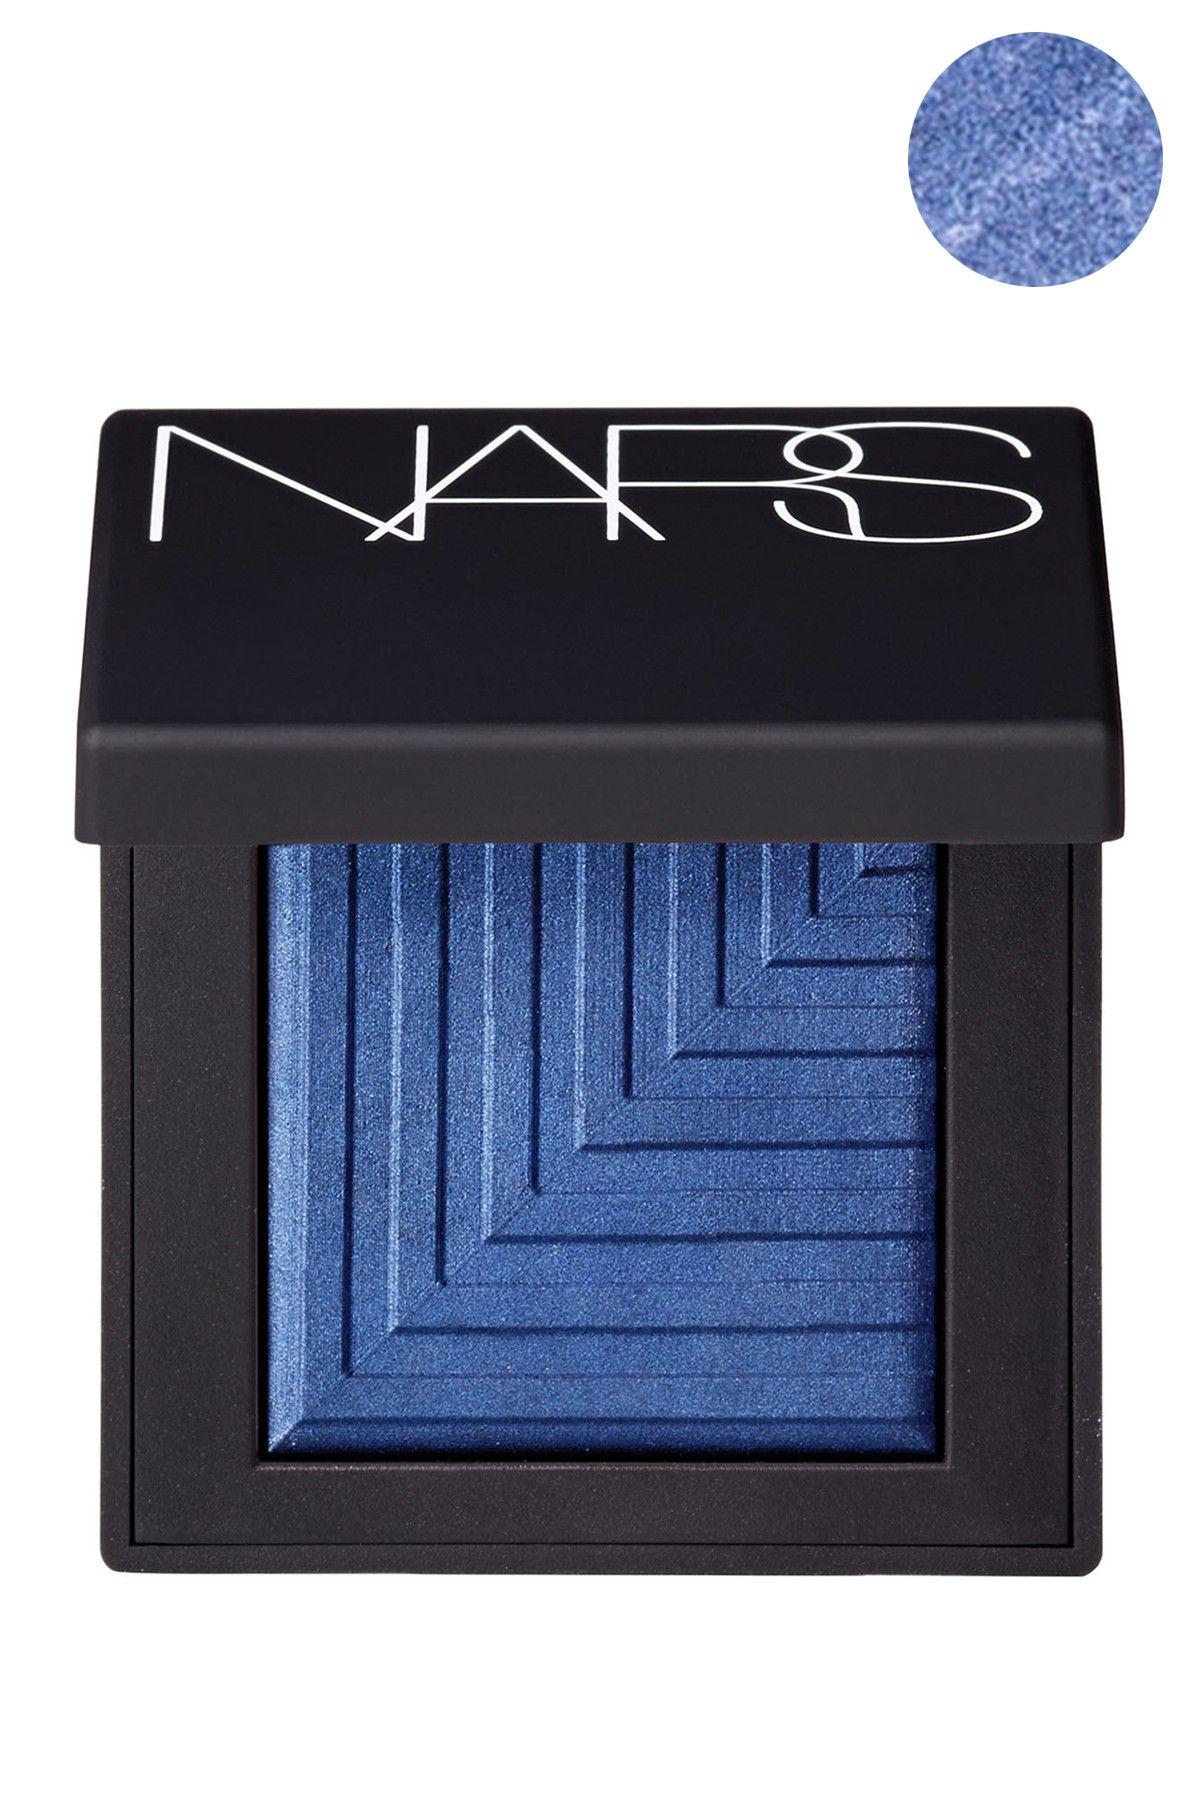 NARS DualIntensity Eyeshadow Cressida is now 55 off